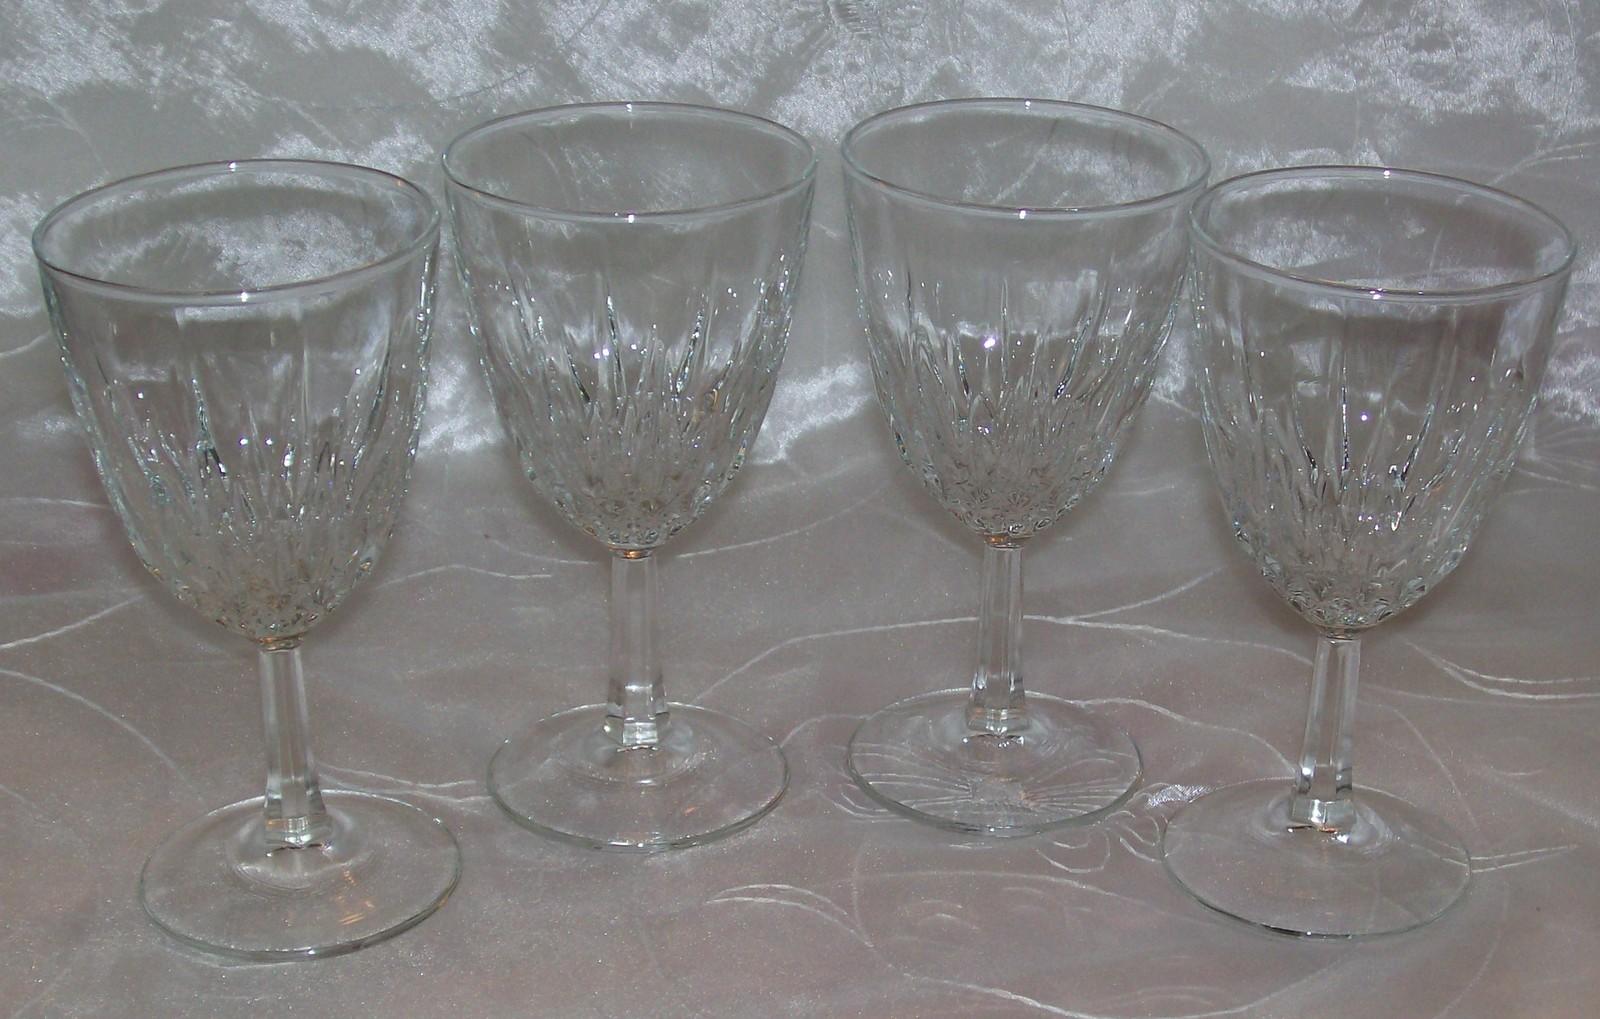 cristal d 39 arques stemware crystal diamant wine glasses set. Black Bedroom Furniture Sets. Home Design Ideas